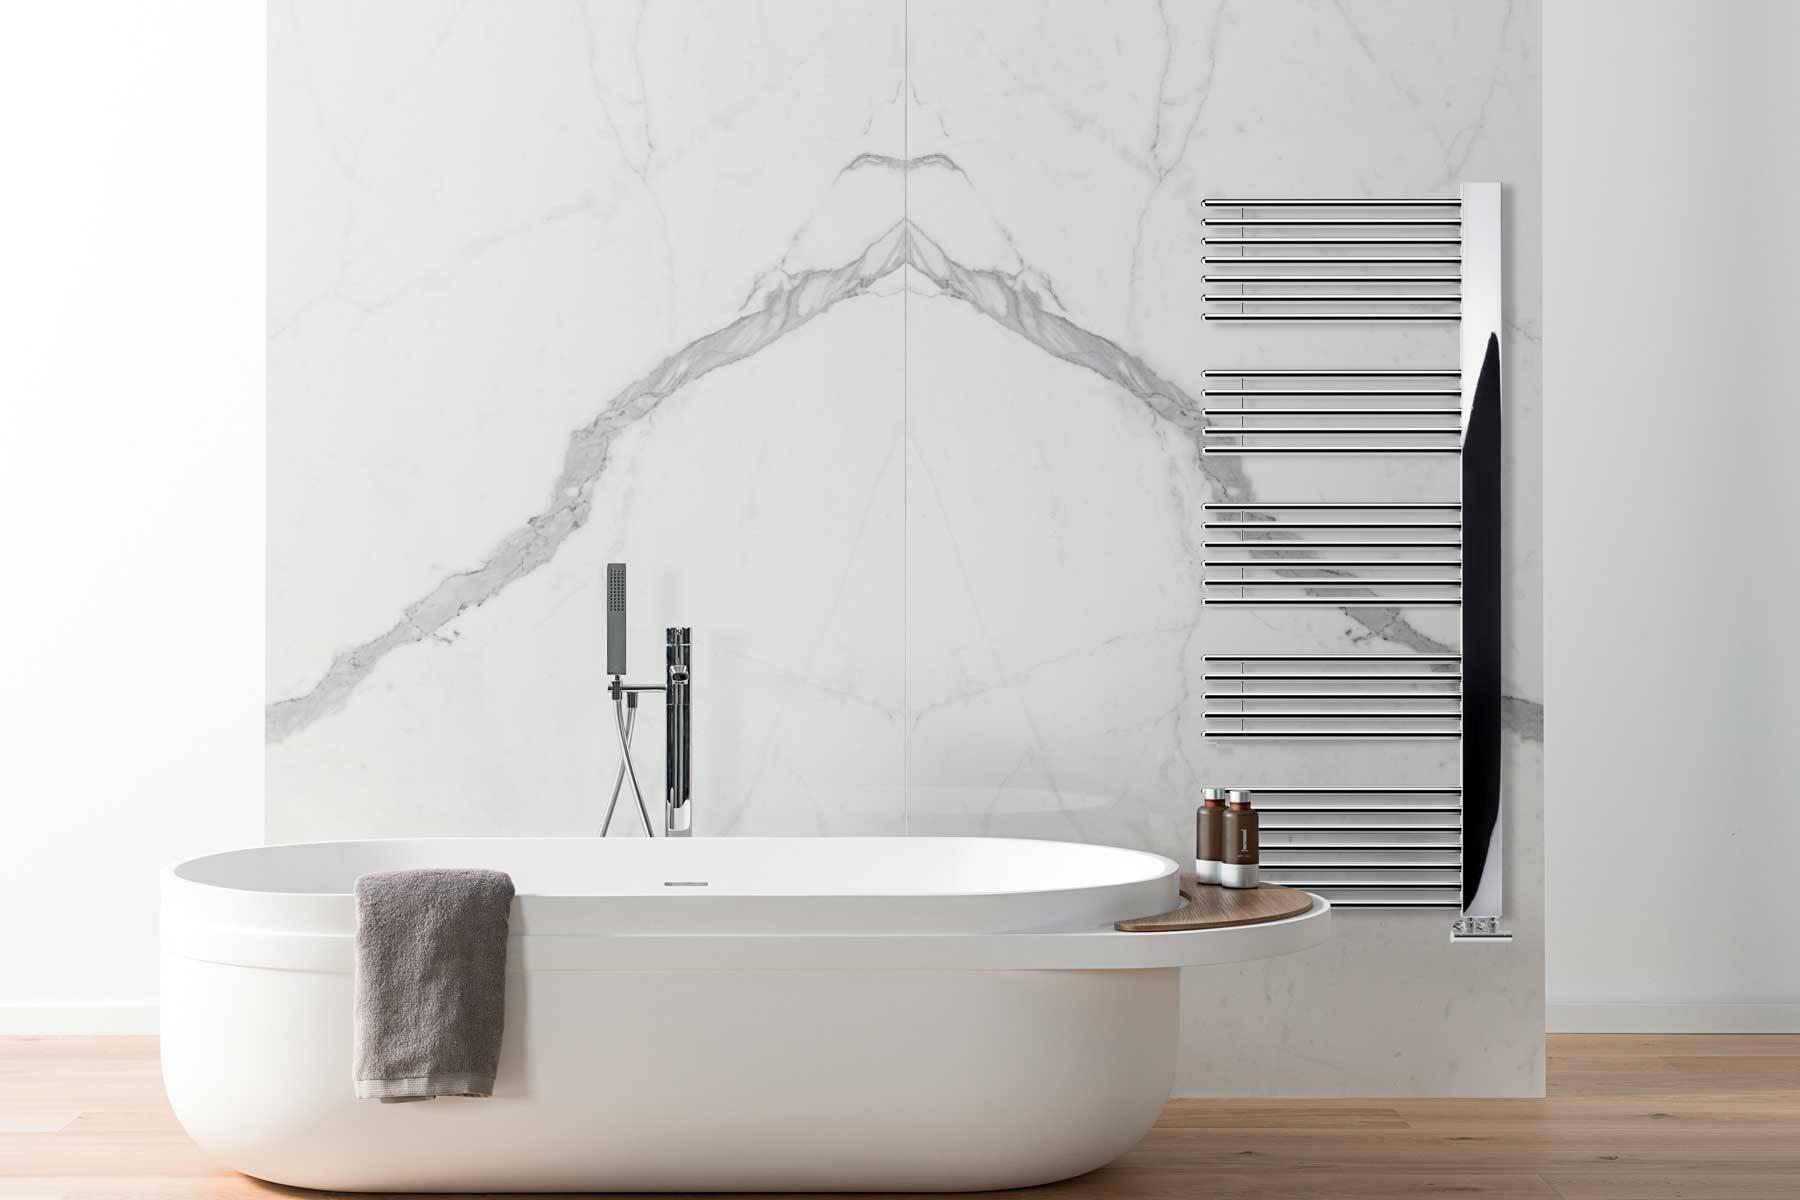 sèche-serviettes Grado lazzarini chrome environnement salle de bain